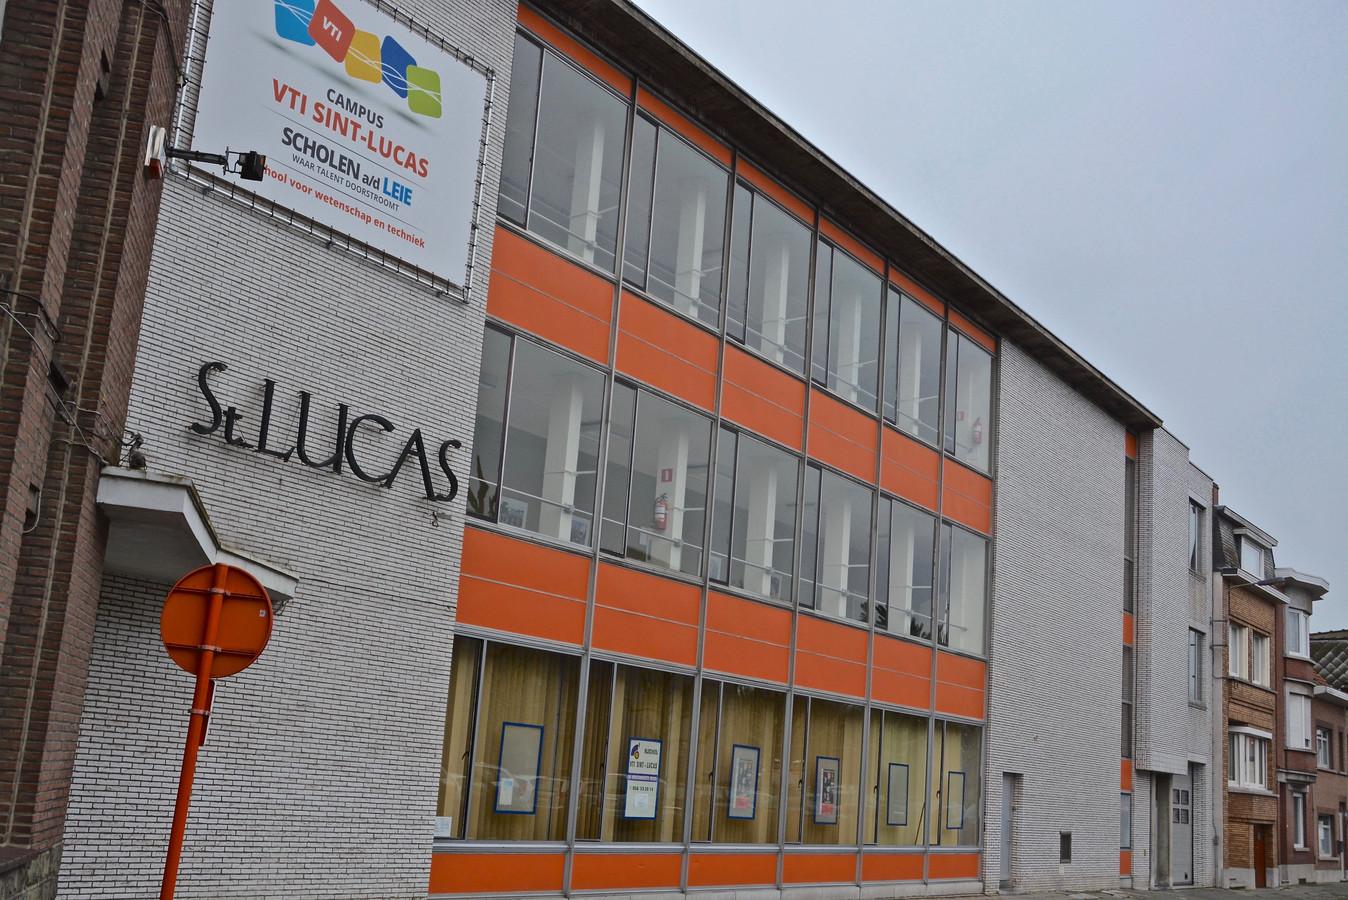 Het VTI Sint-Lucas in Menen.